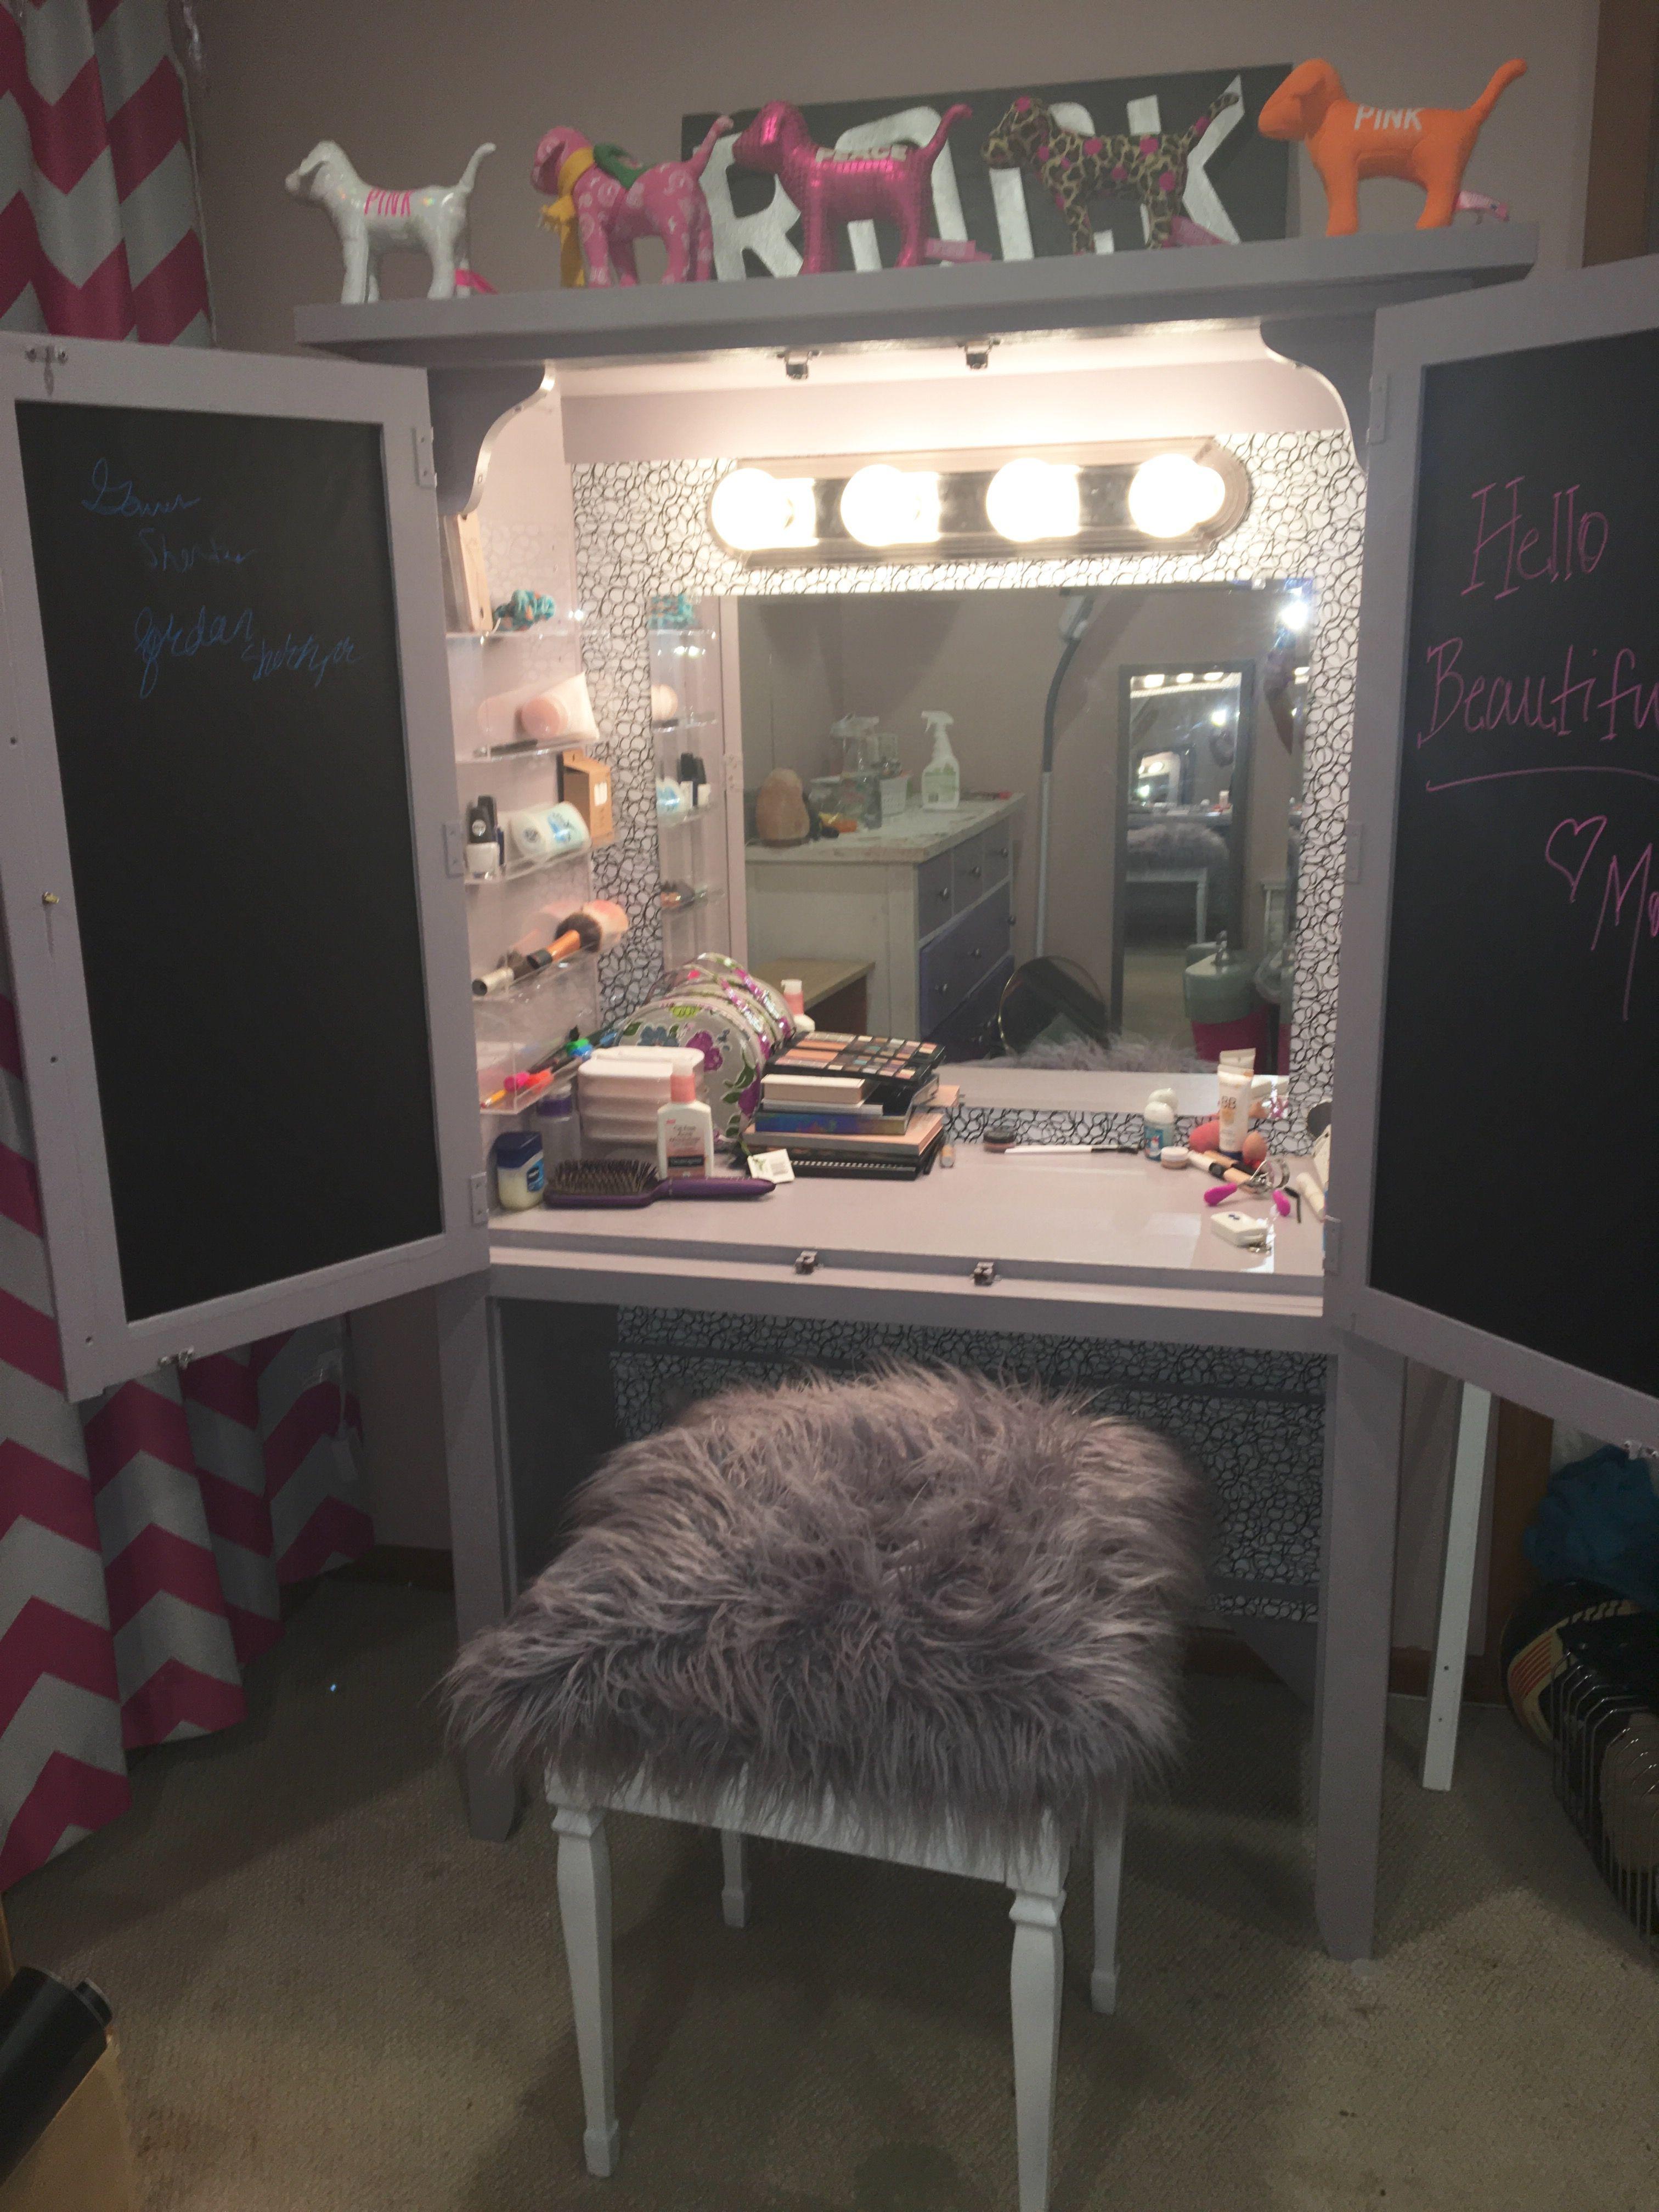 Diy Tv Armoire Turned Into Beauty Vanity Tvarmoireforbedroom